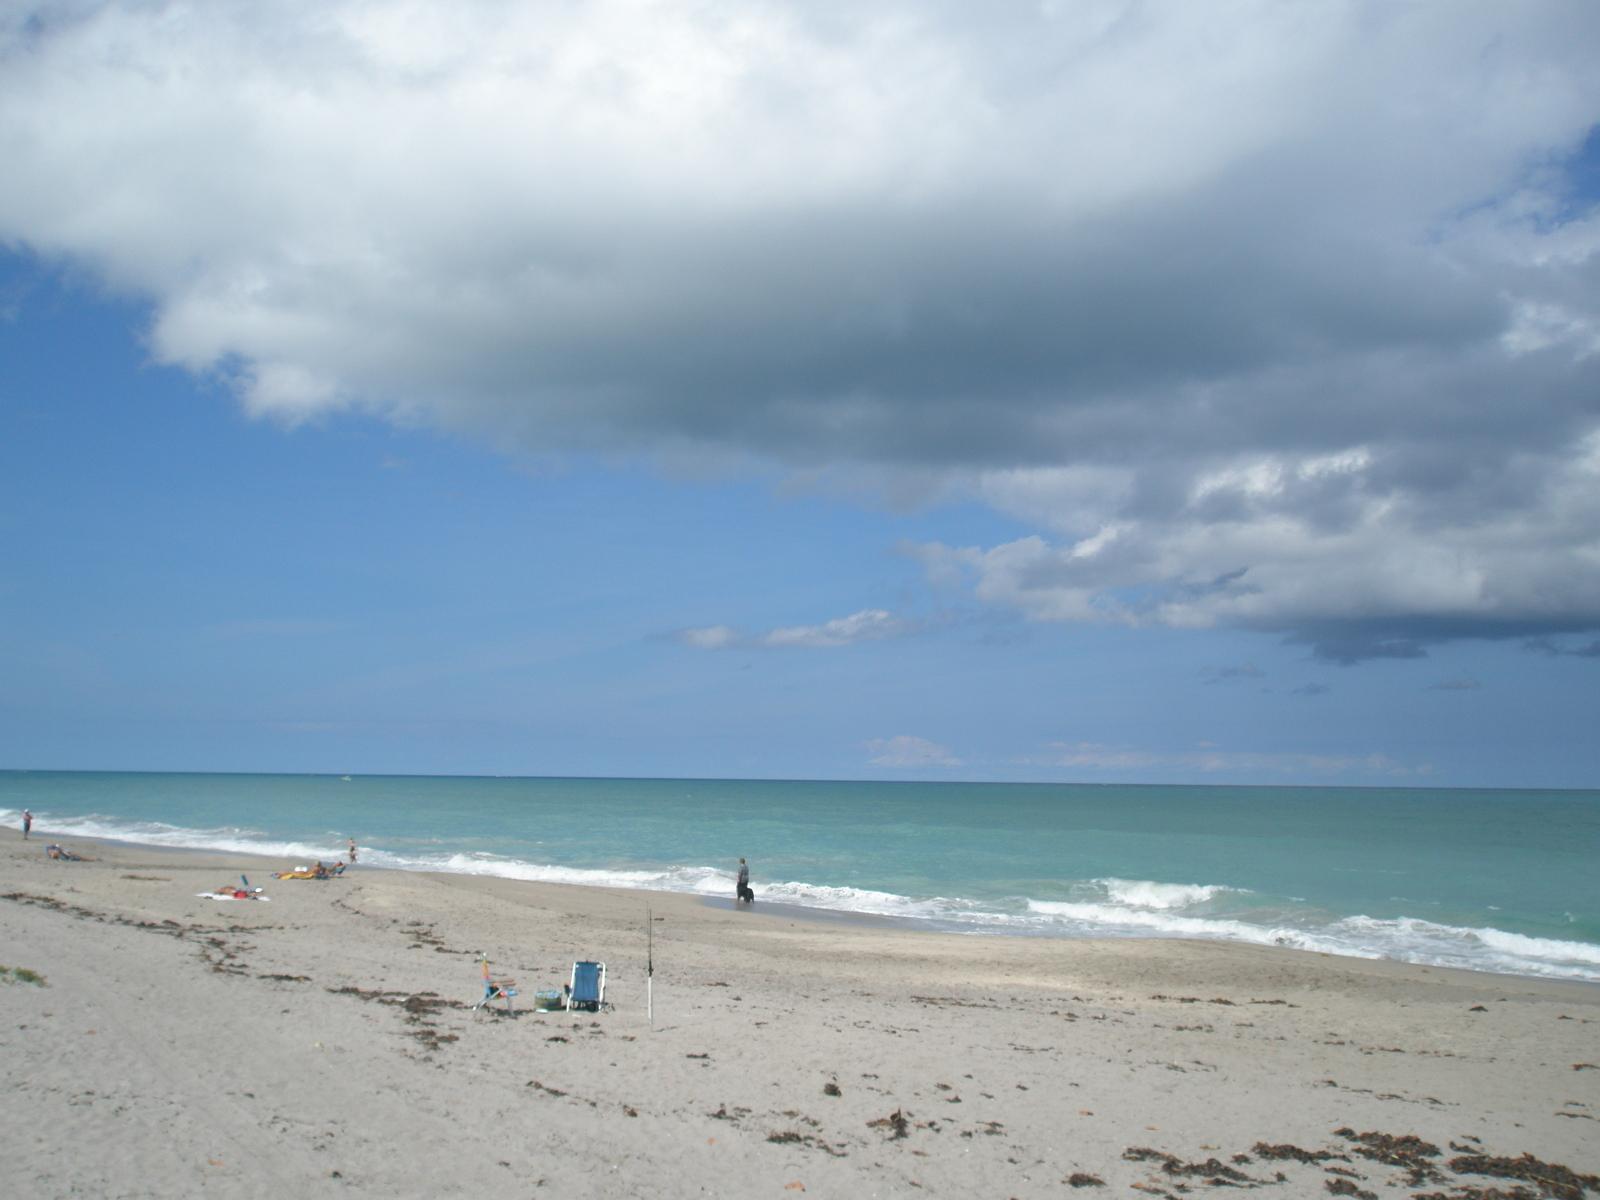 Jupiter FL Jupiter Beach Photo Picture Image Florida